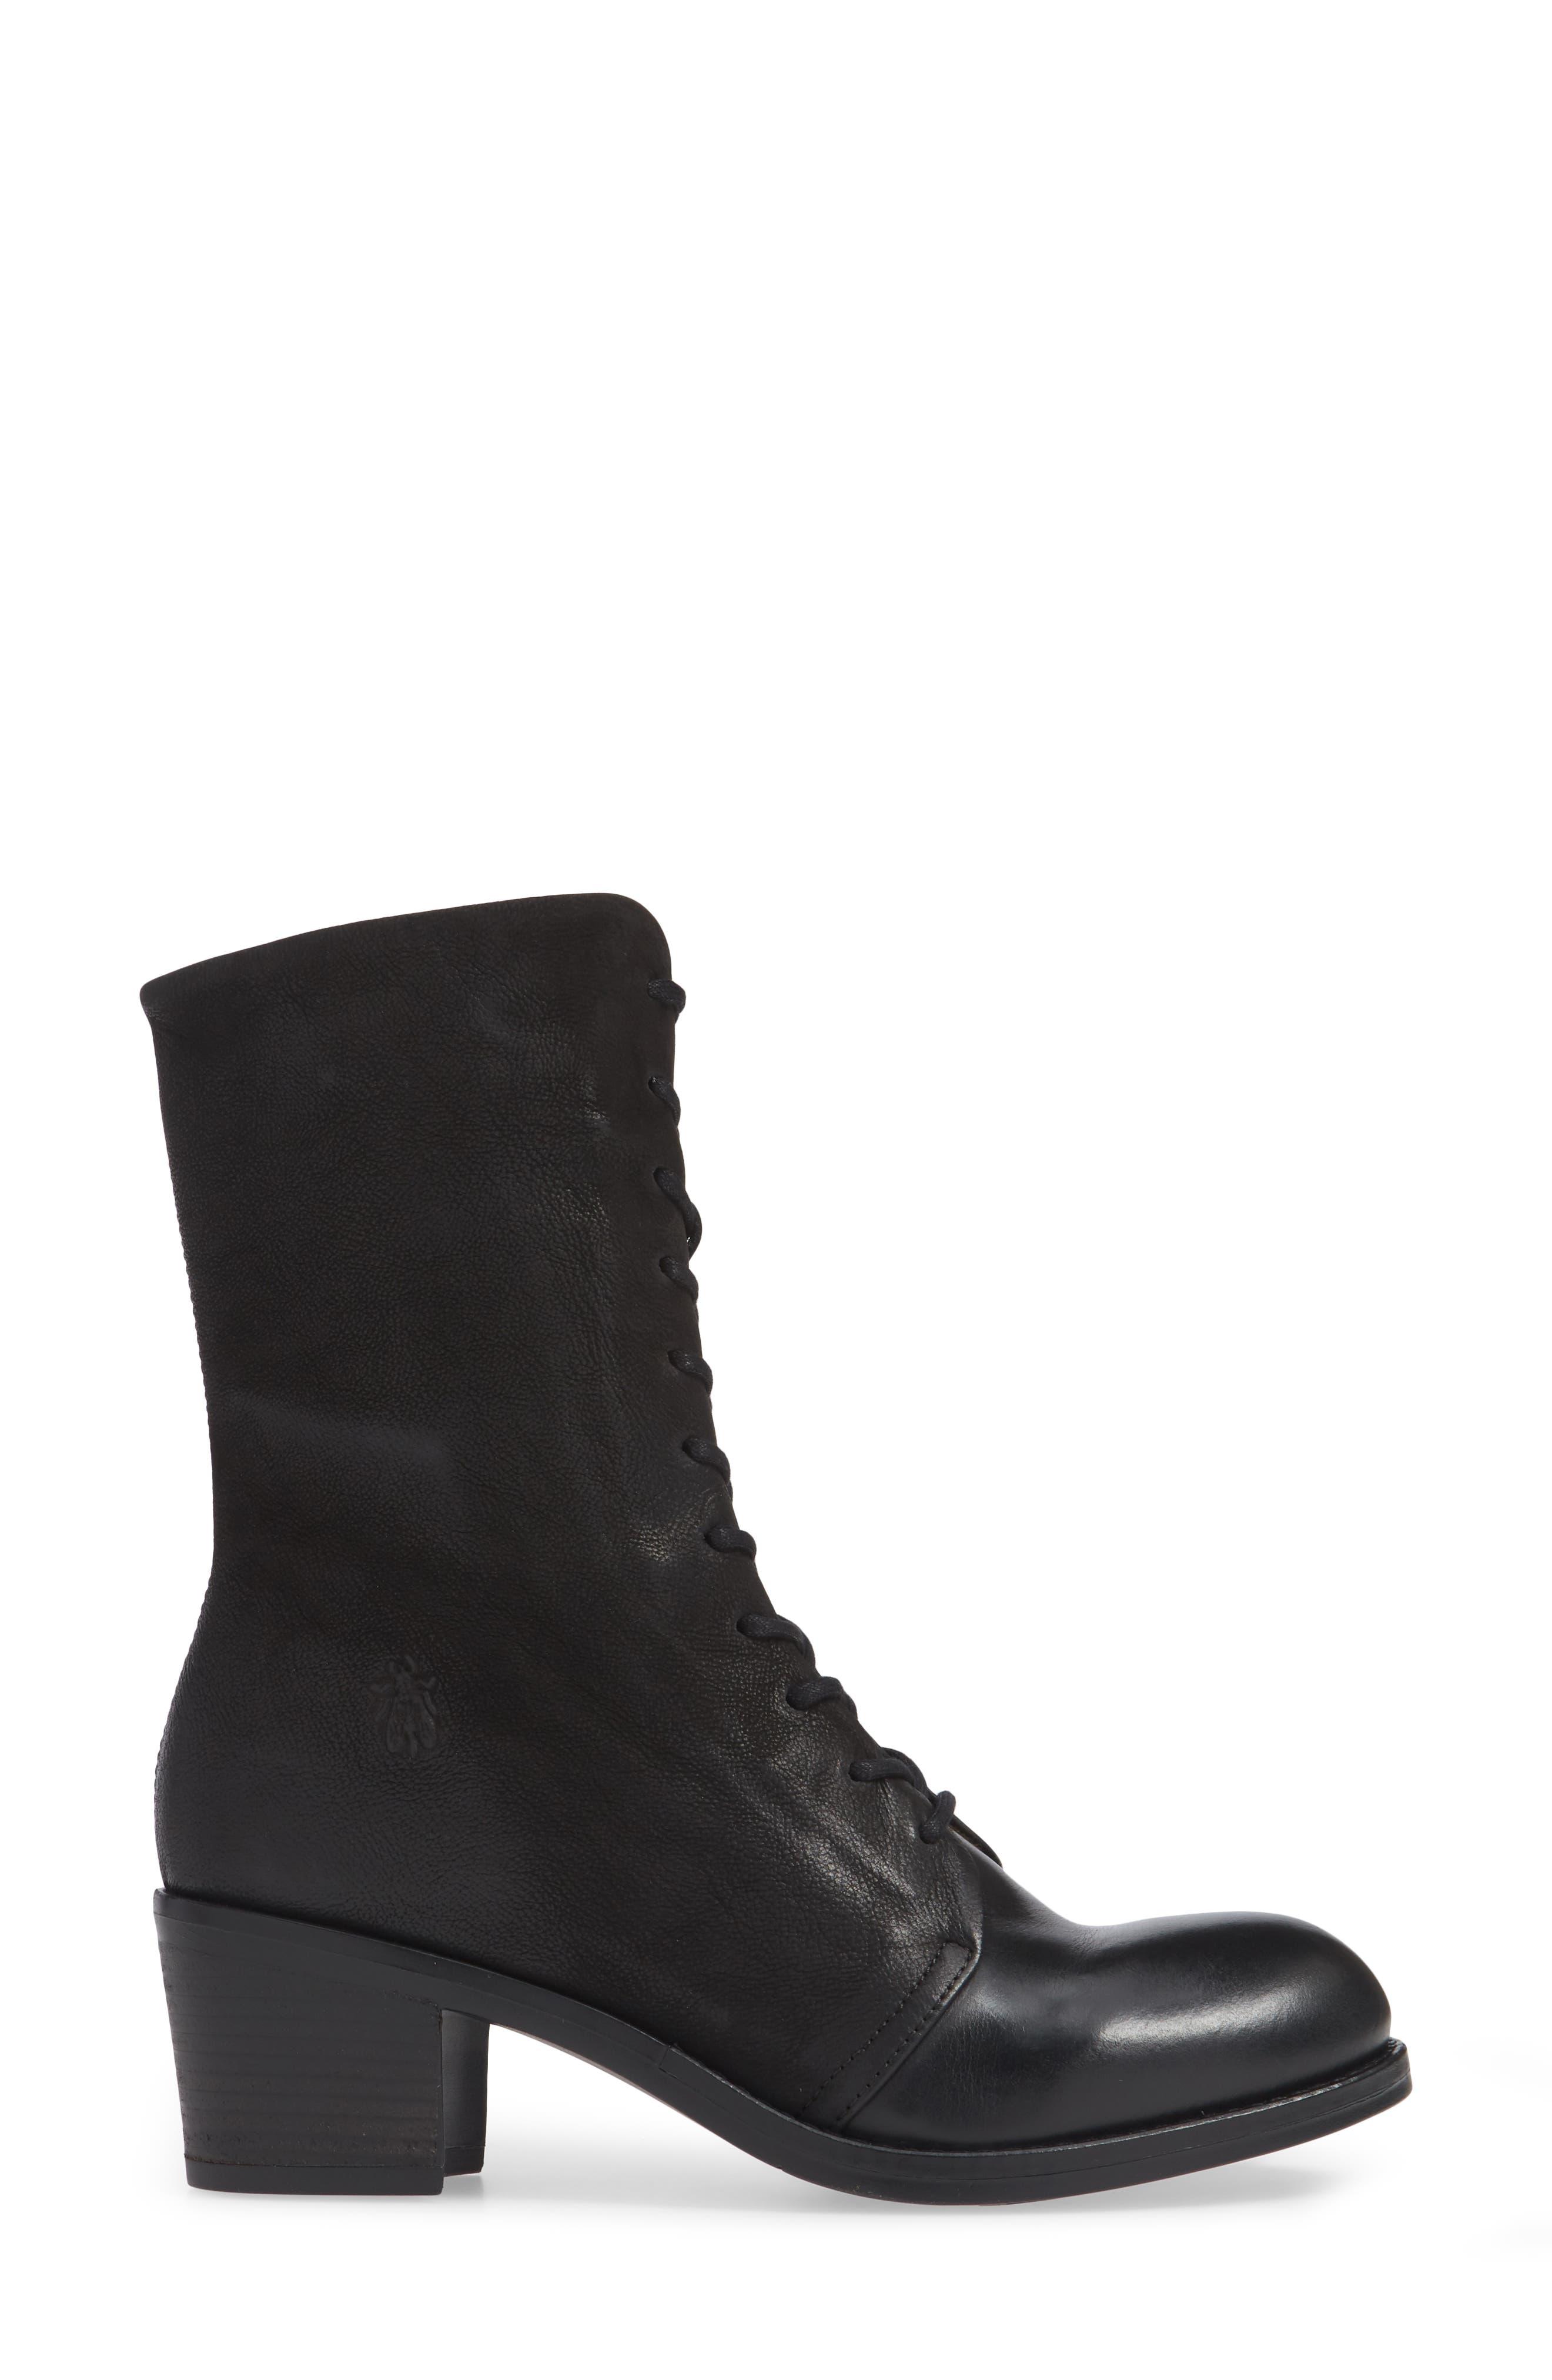 Zeko Lace-Up Boot,                             Alternate thumbnail 3, color,                             BLACK